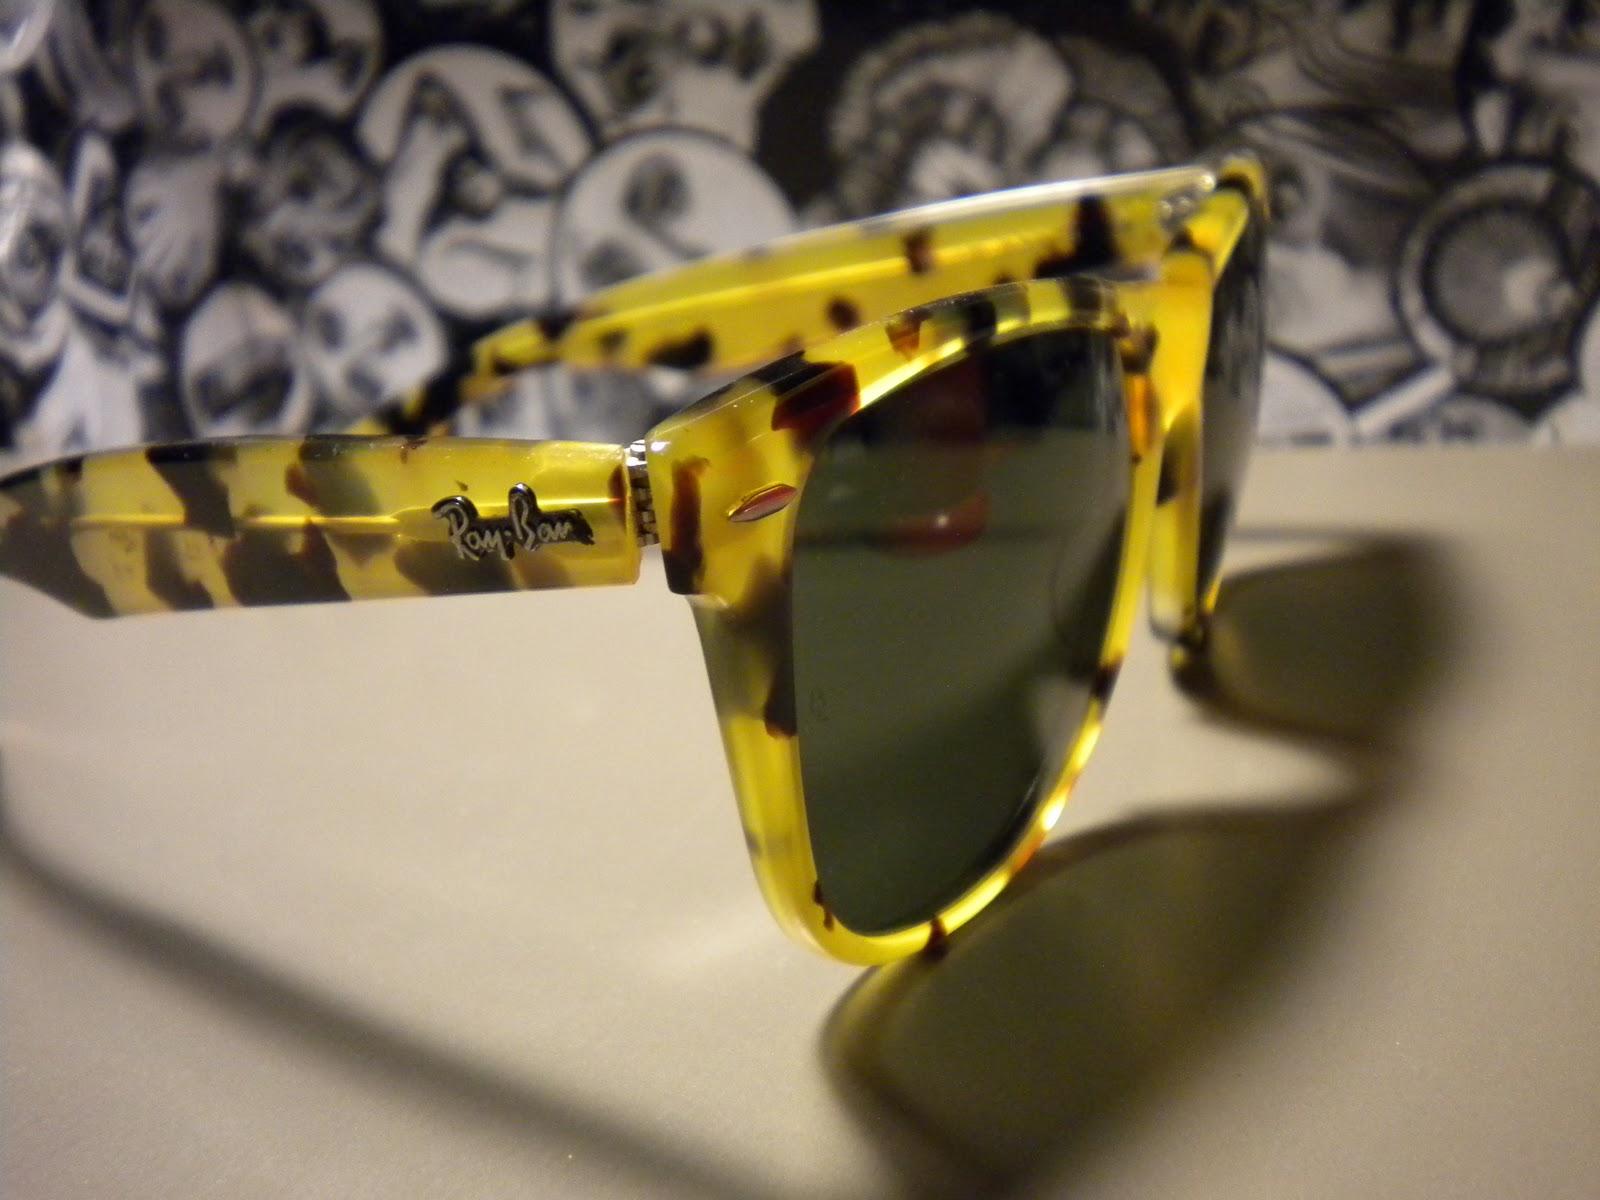 535c3cbd1b8 Ray Ban Two Tone Wayfarer Sunglasses Tortoise Yellow « One More Soul